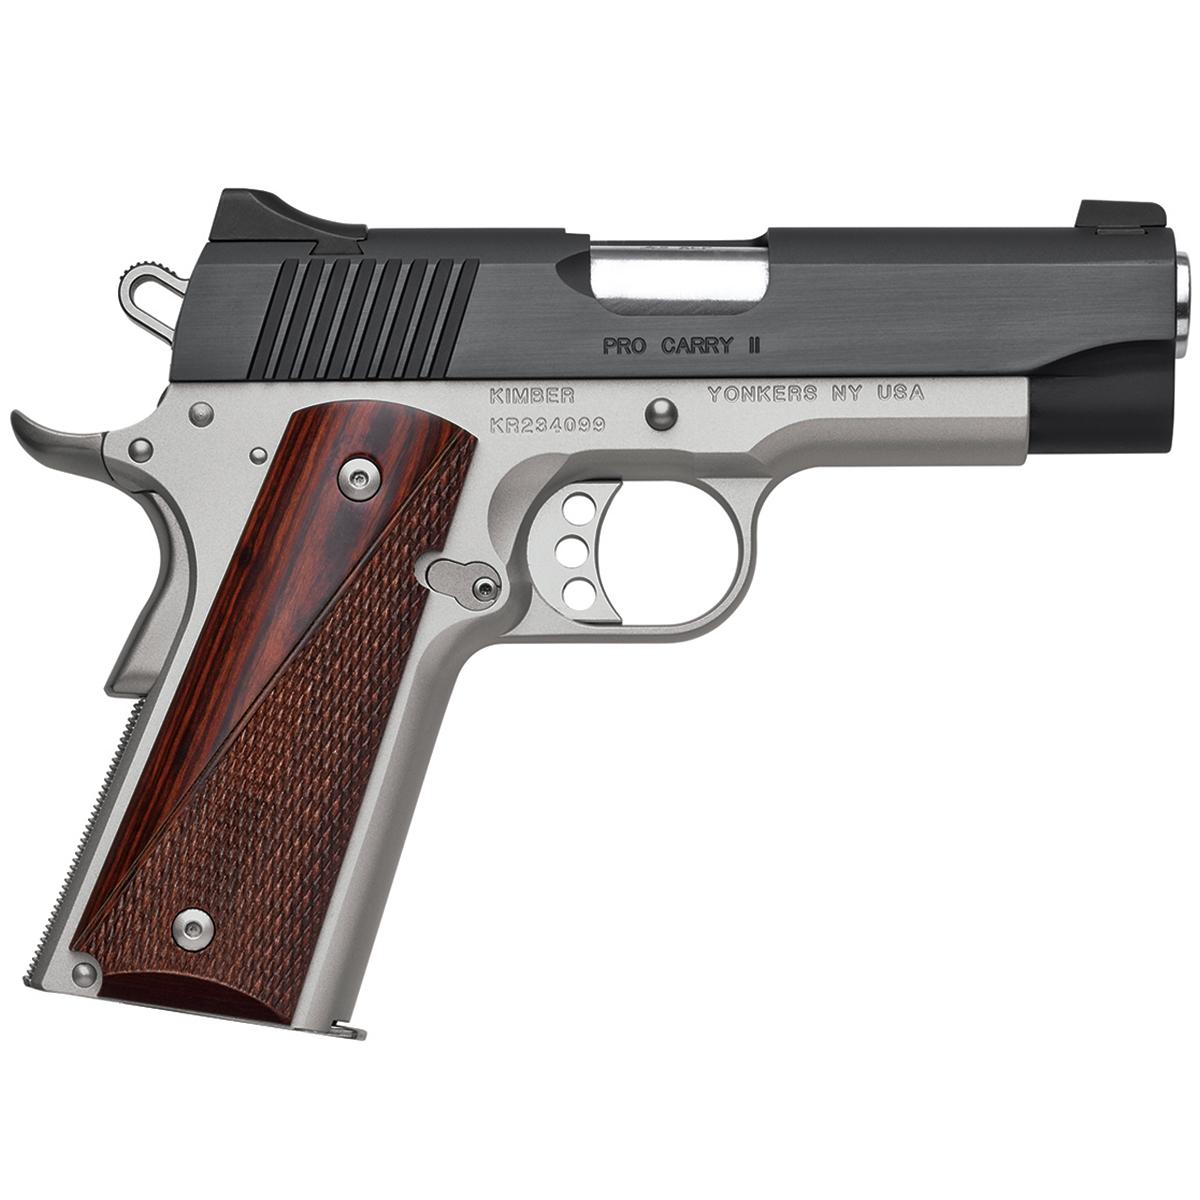 Kimber Pro Carry II Two-Tone Handgun